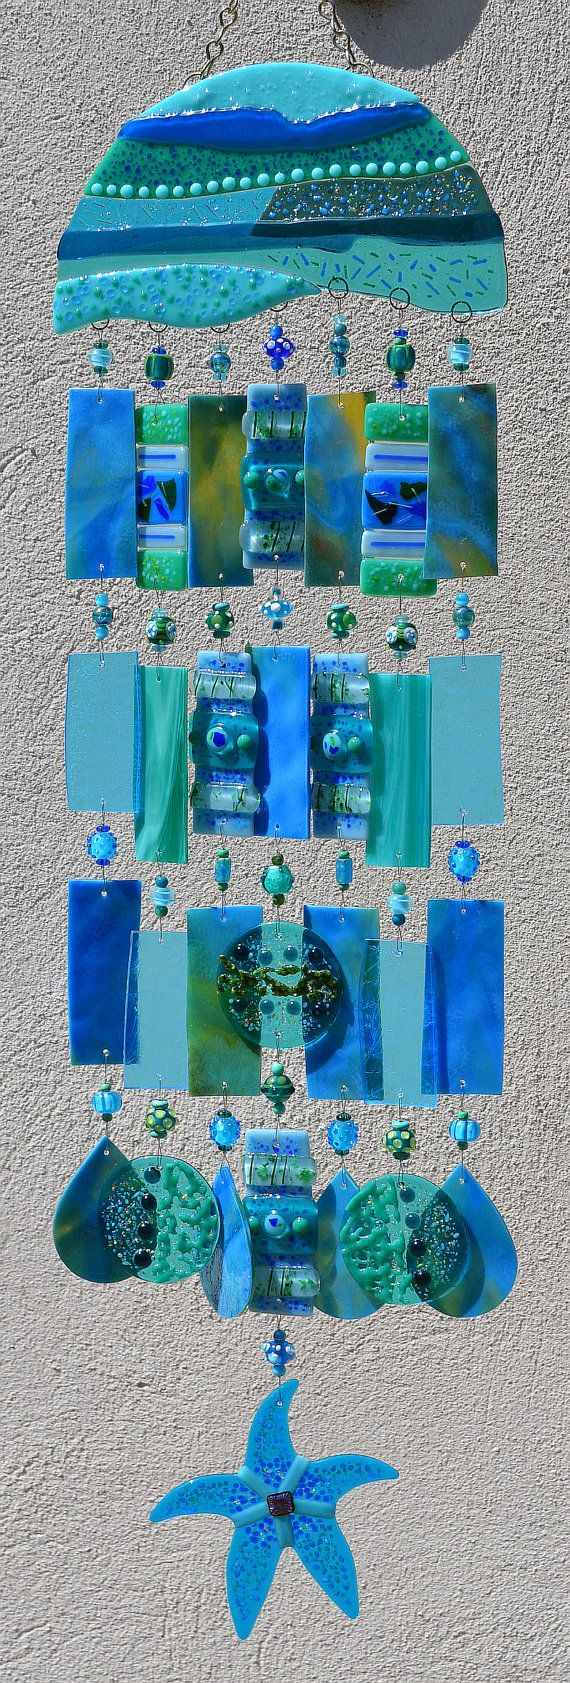 Kirks Glass Art Fused Stained Glass Wind Chime por kirksglassart